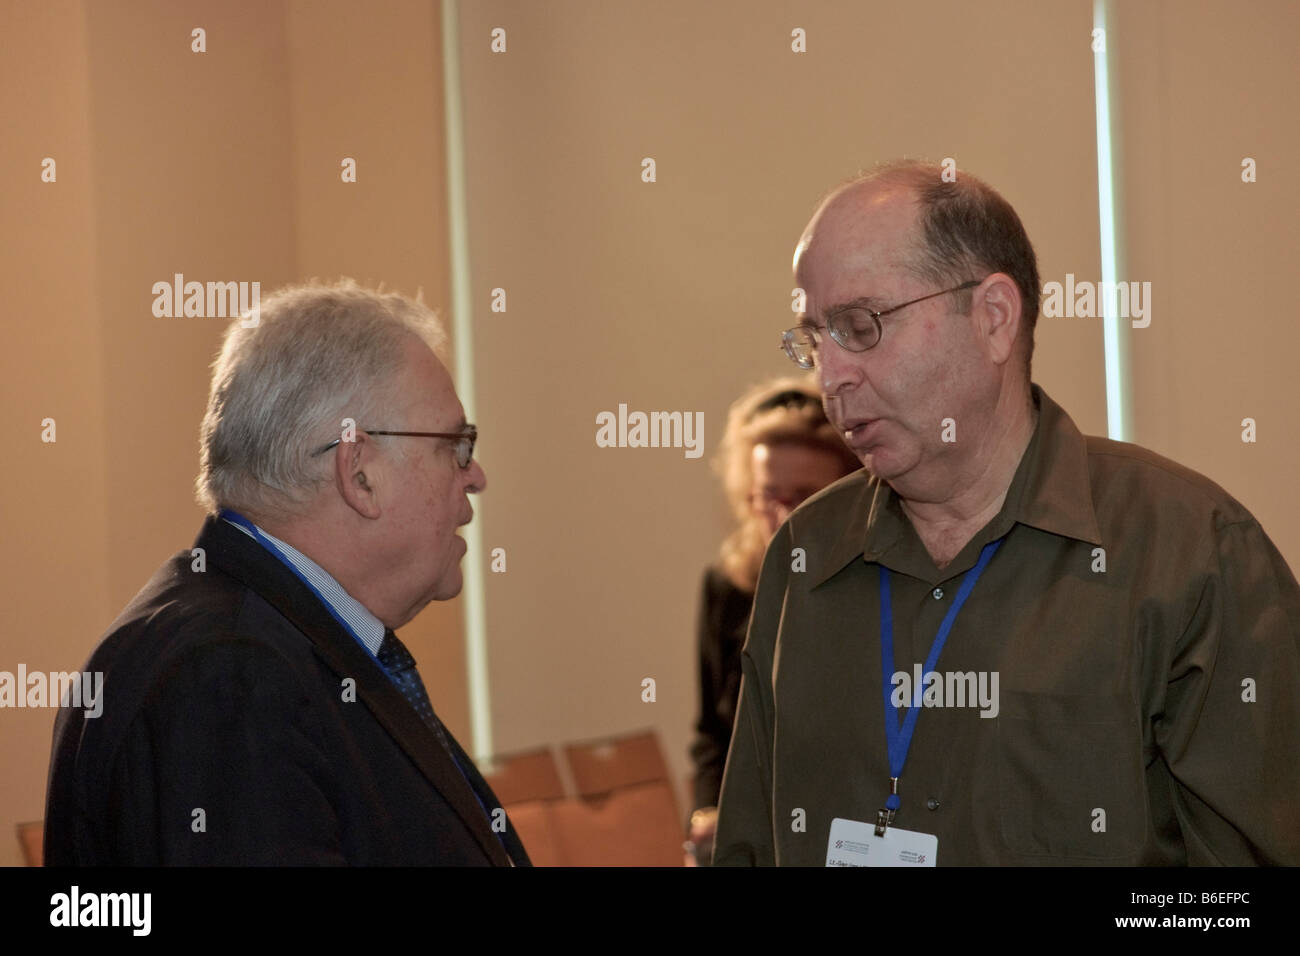 Prof. Edward Luttwak and Lt. Gen. (Ret.) Moshe Yaalon during the Adelson Institute's Dec. 2008 Counterinsurgency Stock Photo